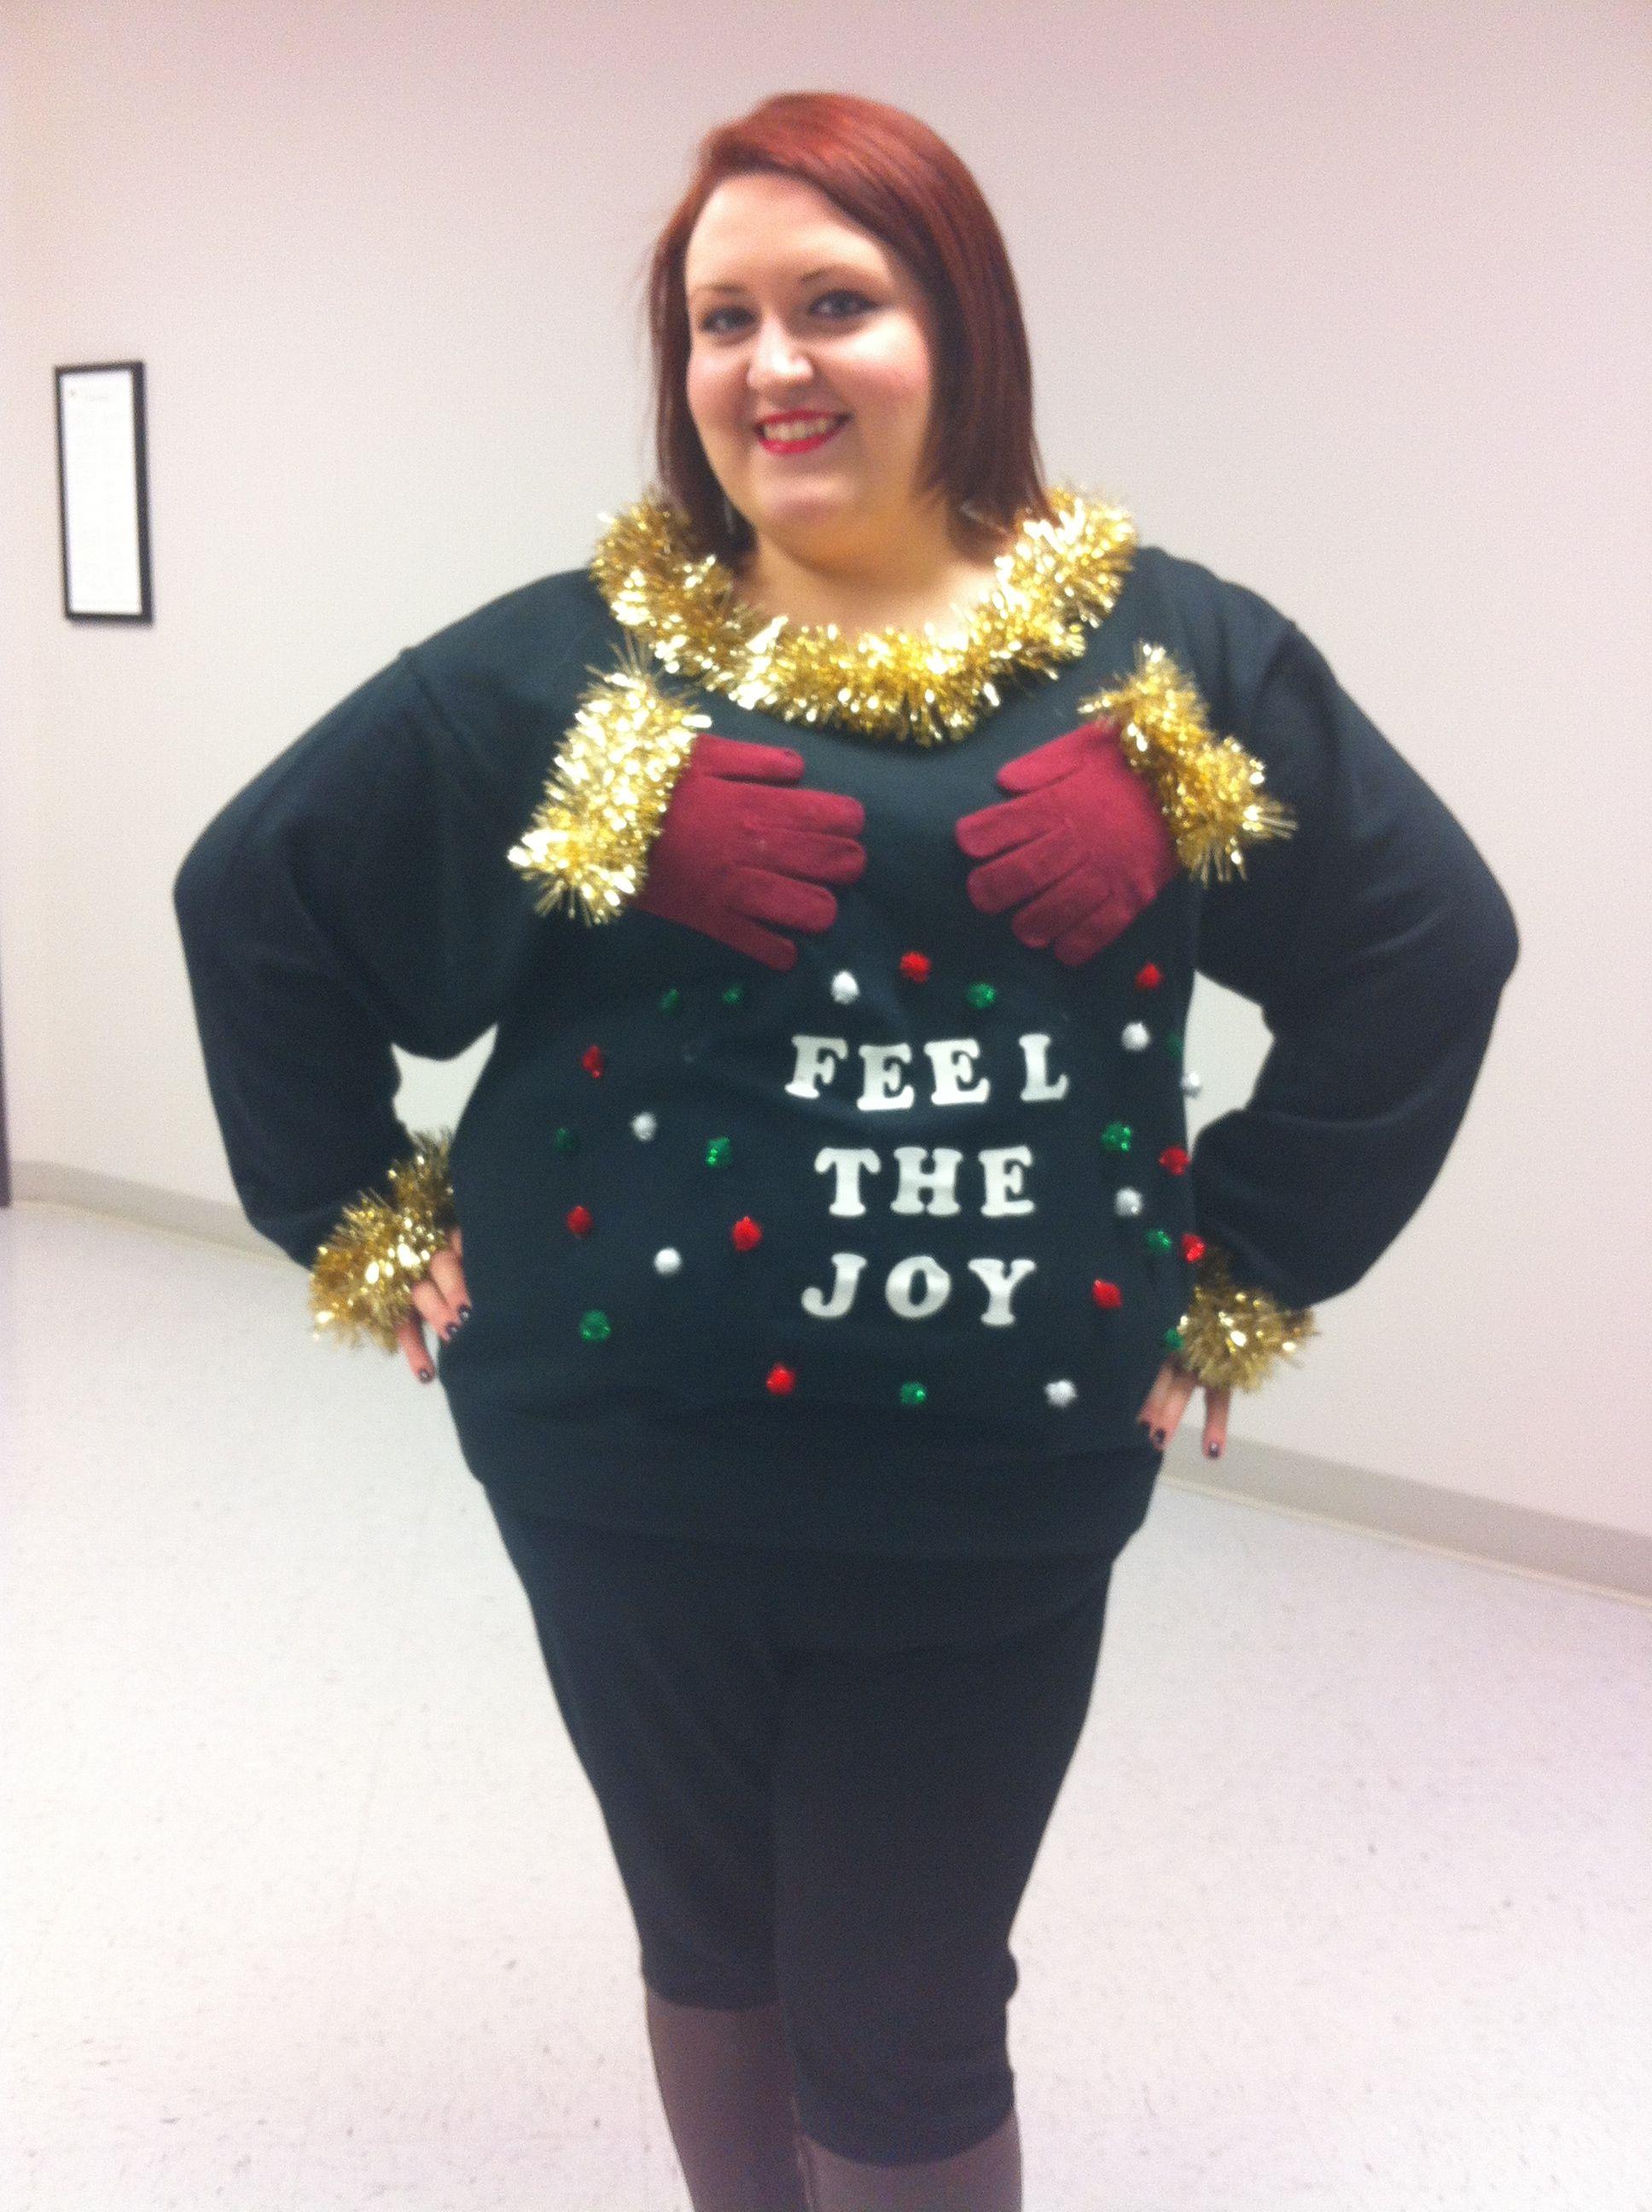 feel the joy tacky christmas sweater - Feel The Joy Christmas Sweater